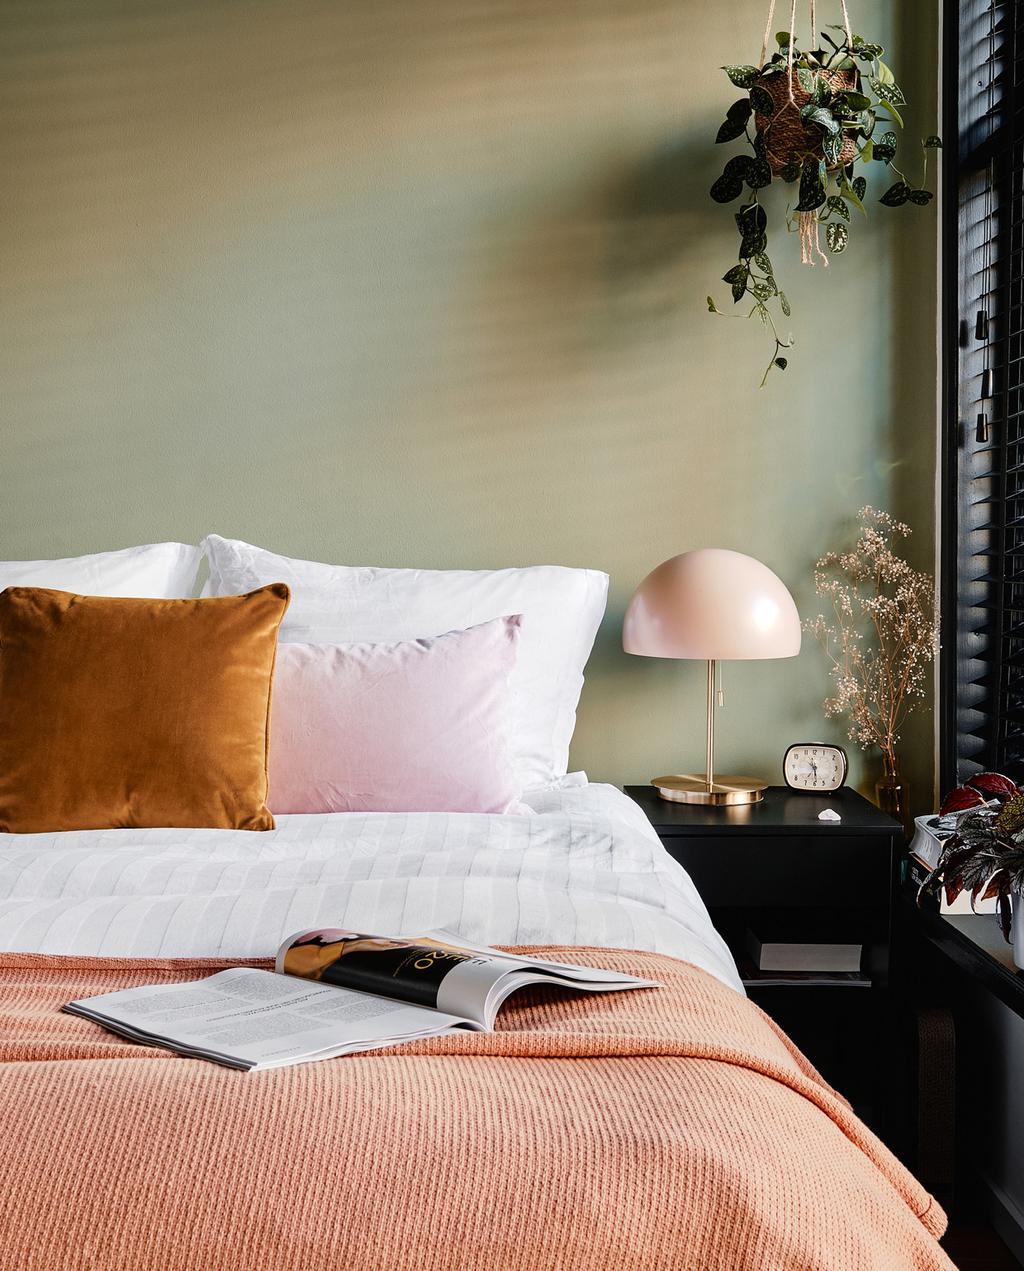 Groene muur | roze dekbedovertrek | lamp | vtwonen 02-2021